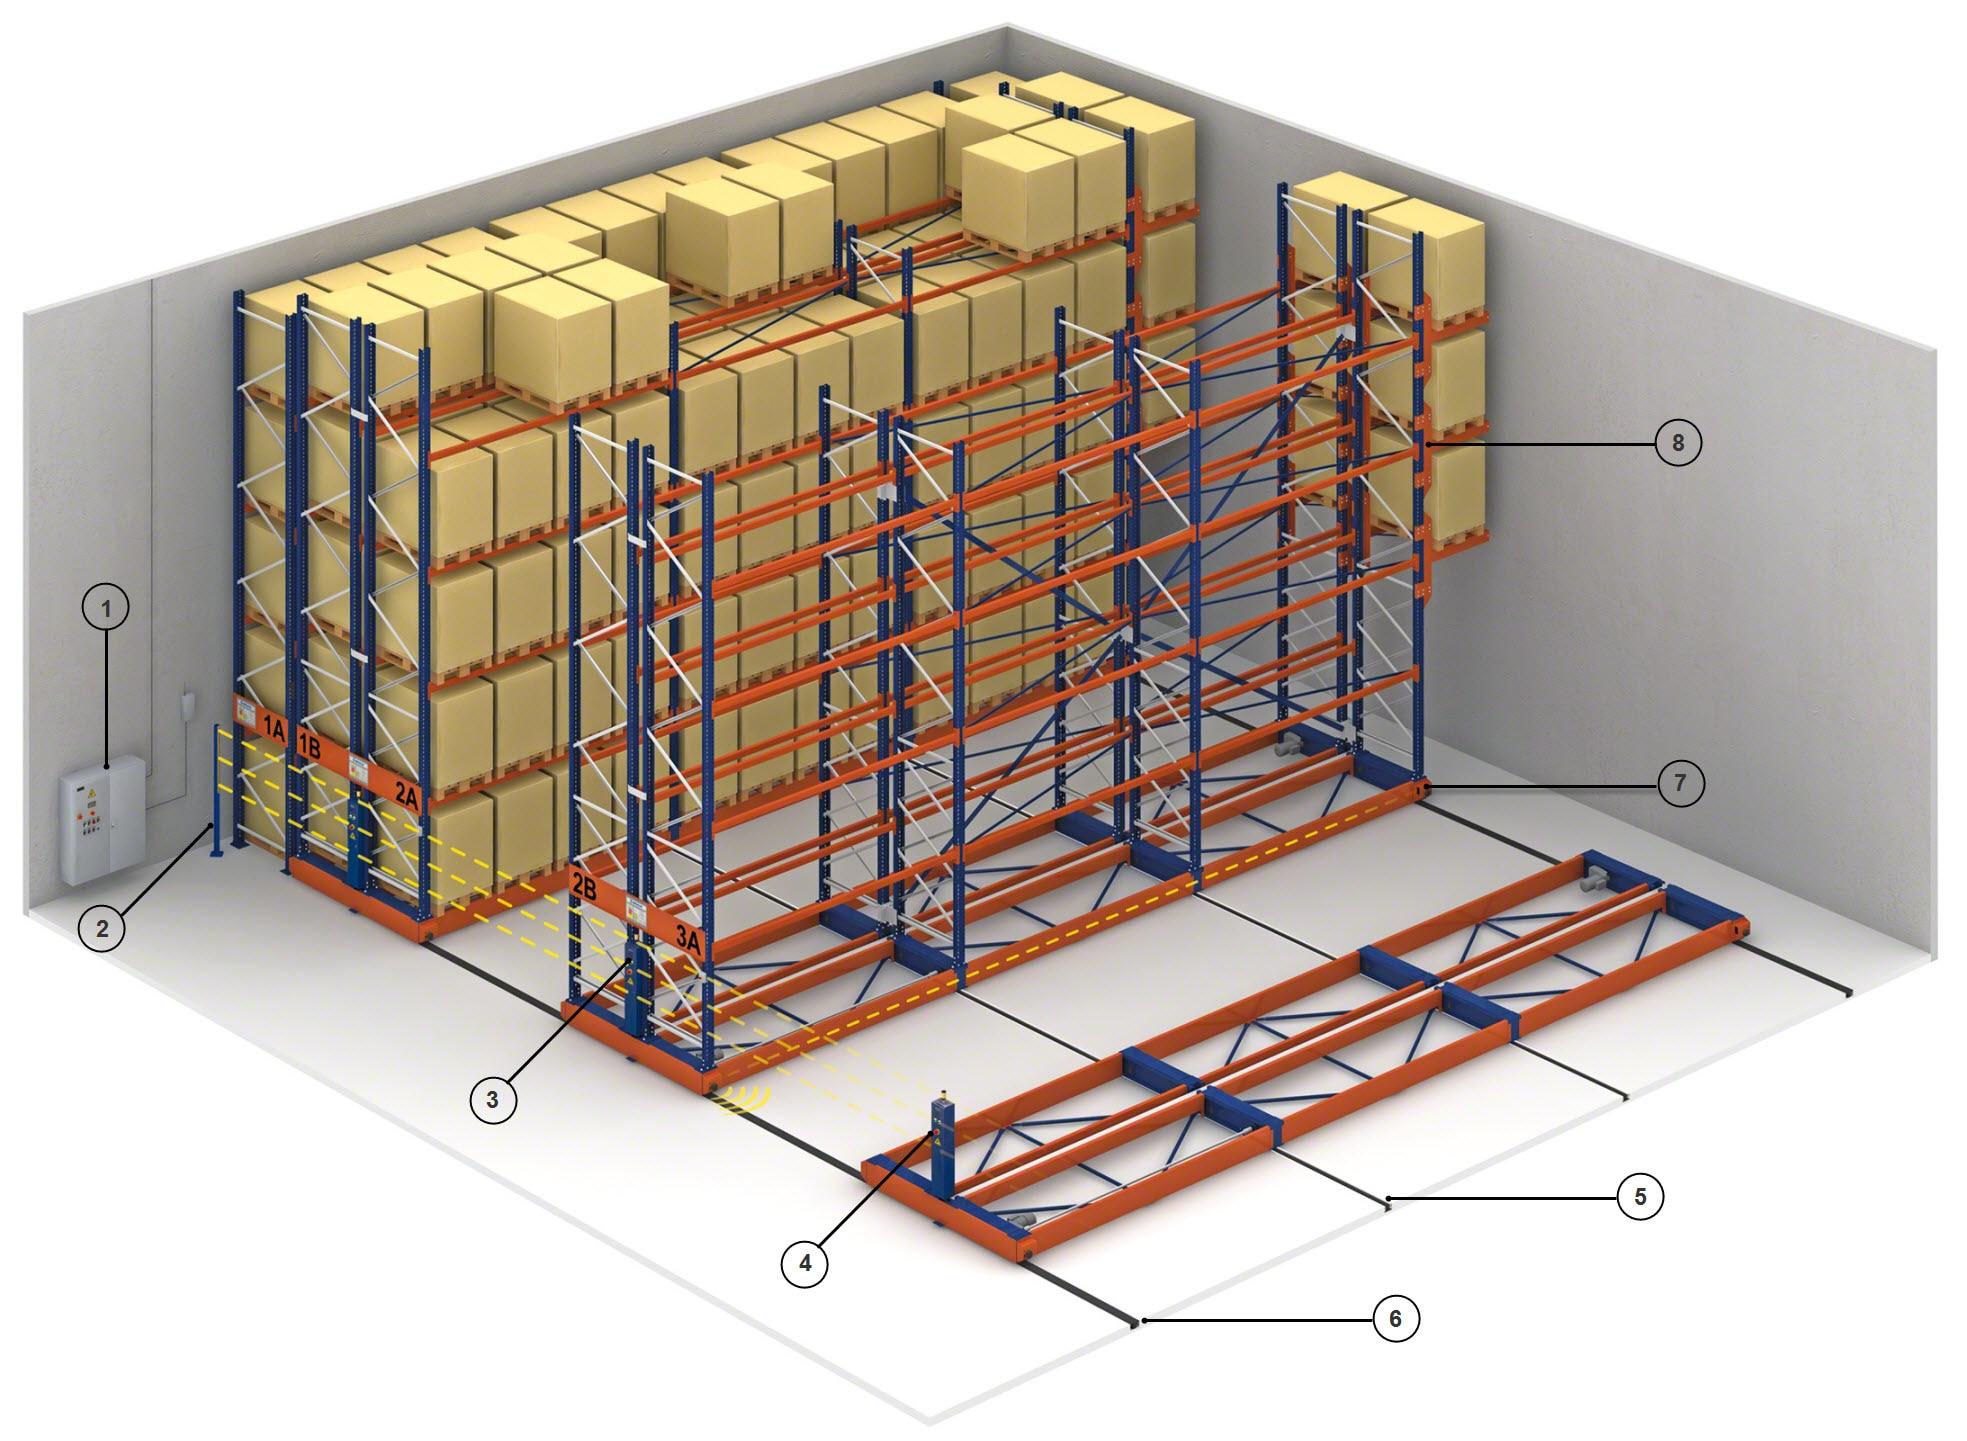 Basic components of Movirack mobile racks